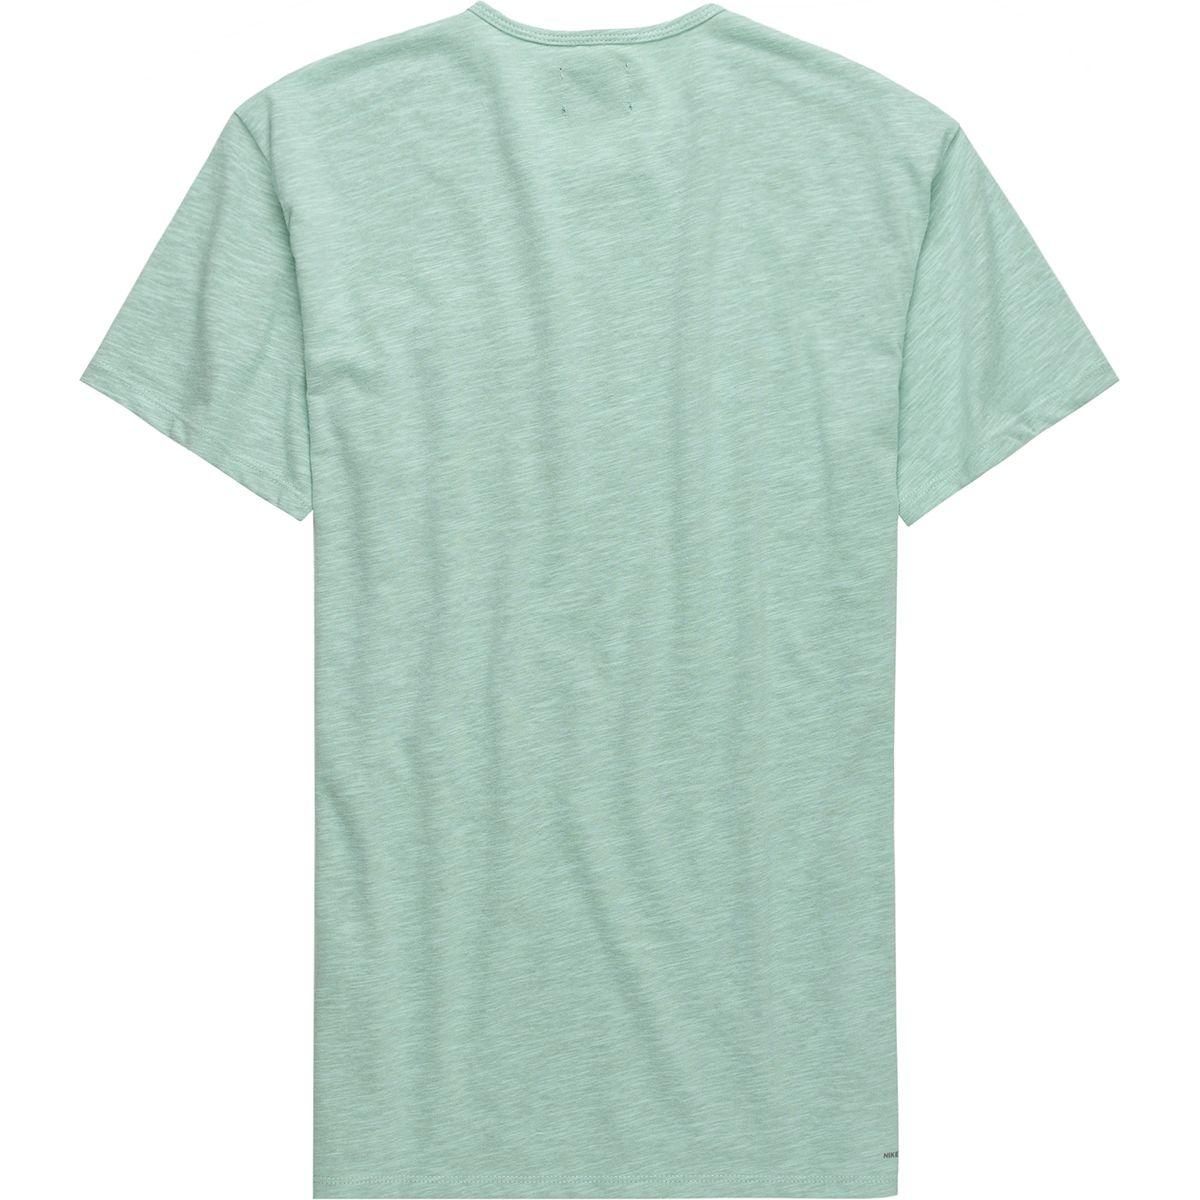 Hurley-Men-039-s-Dri-FIT-Lagos-Port-Tee-T-Shirt thumbnail 3